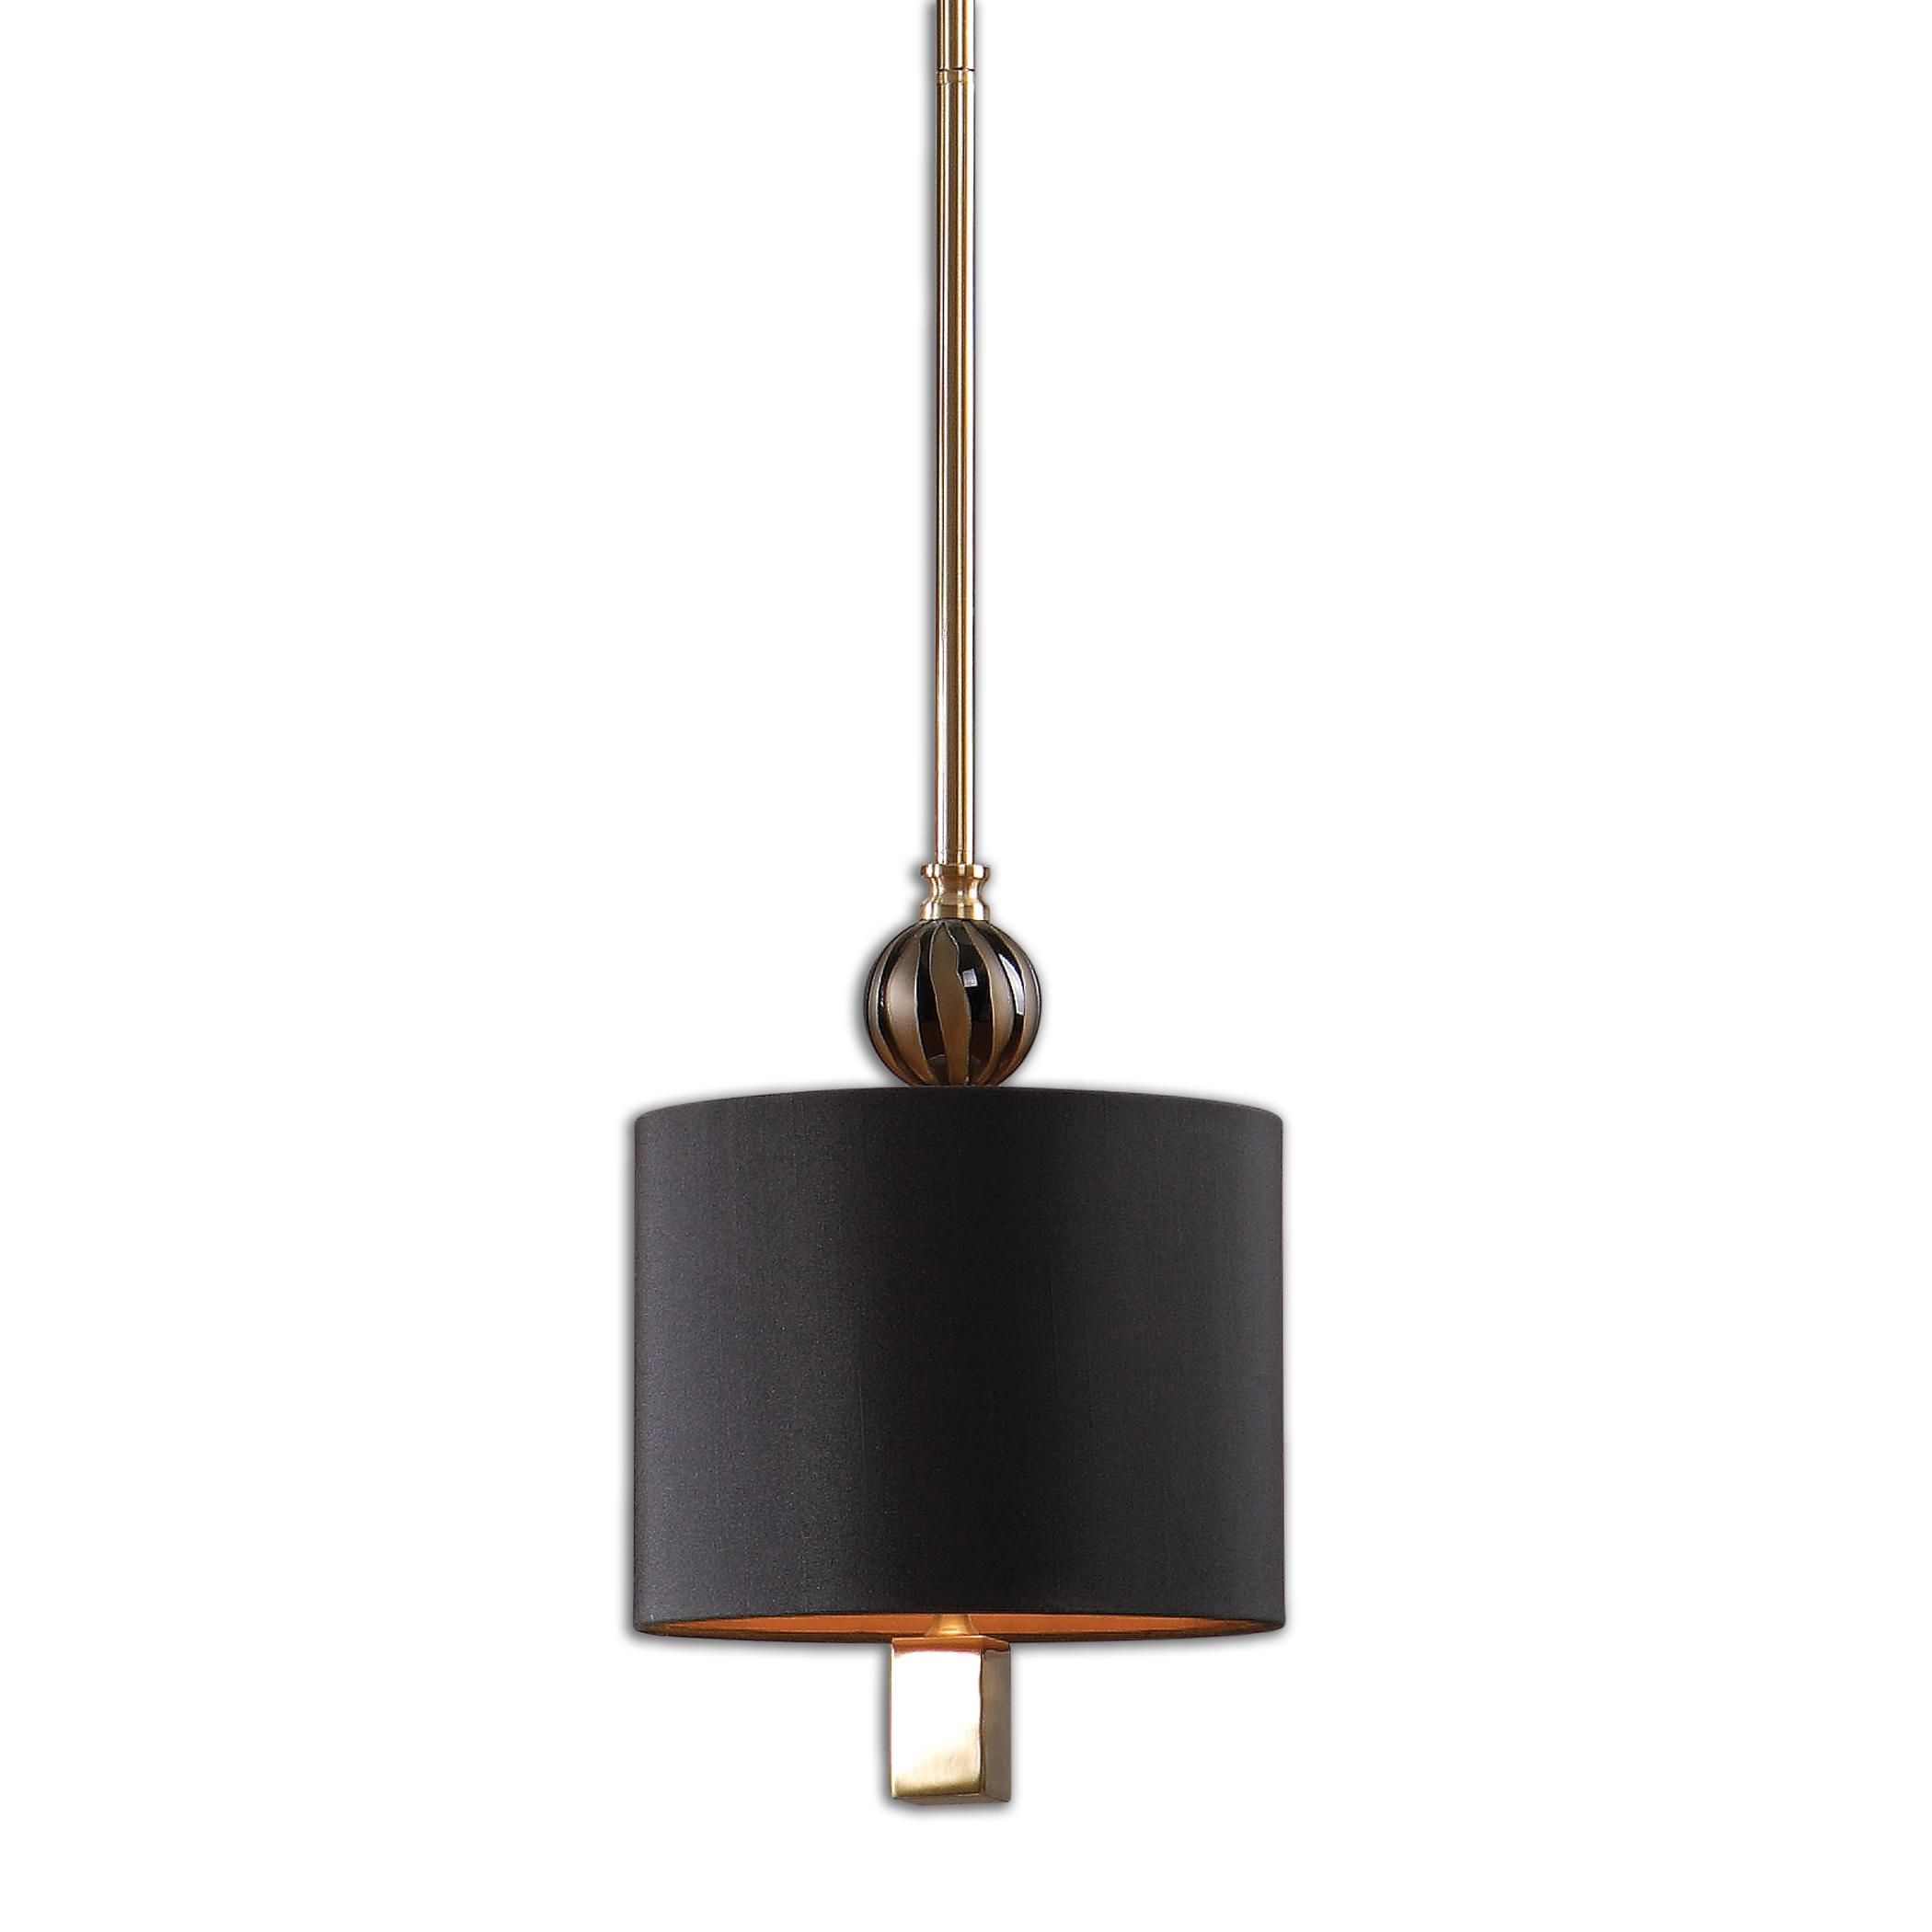 Uttermost Lighting Fixtures Uttermost Amur 1 Light Modern Mini Pendant - Item Number: 22032